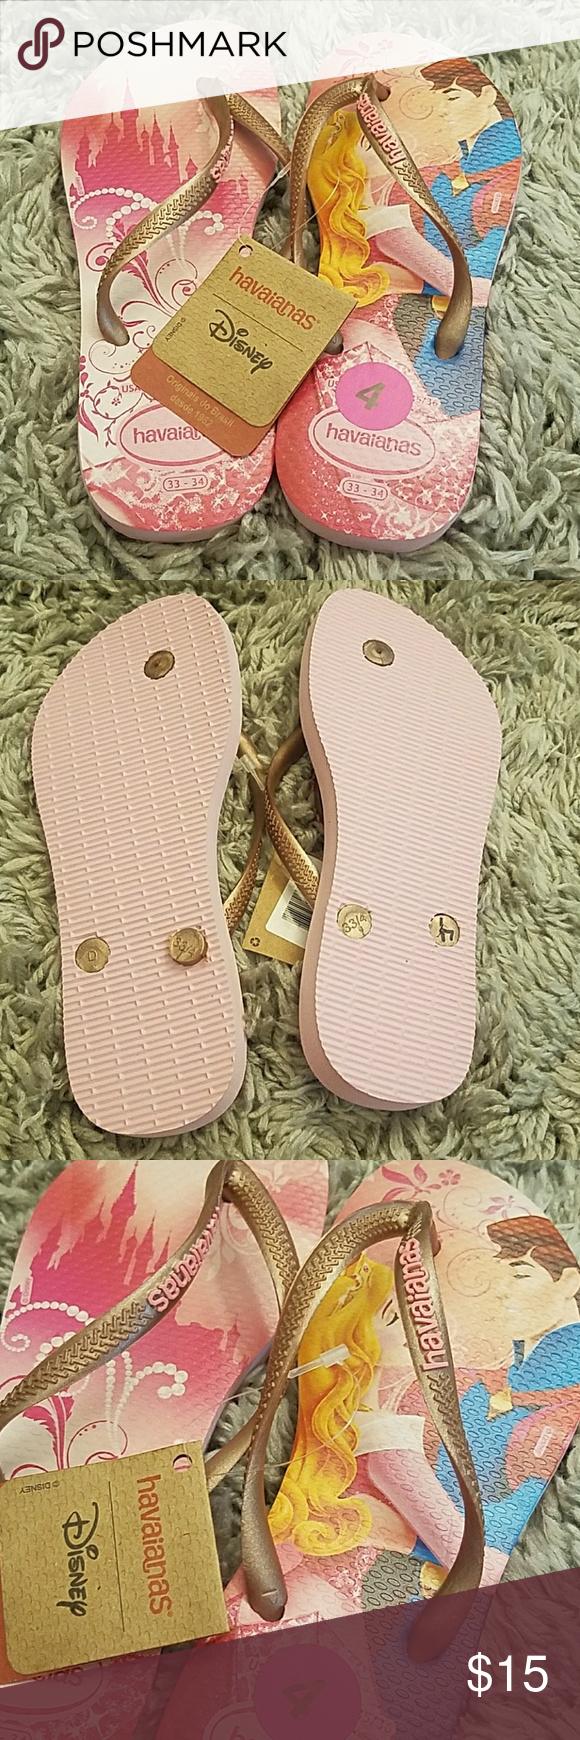 bf372d715d0bae Havaianas Disney Sleeping Beauty Aurora NWT Size 4 Havaianas Shoes Sandals    Flip Flops